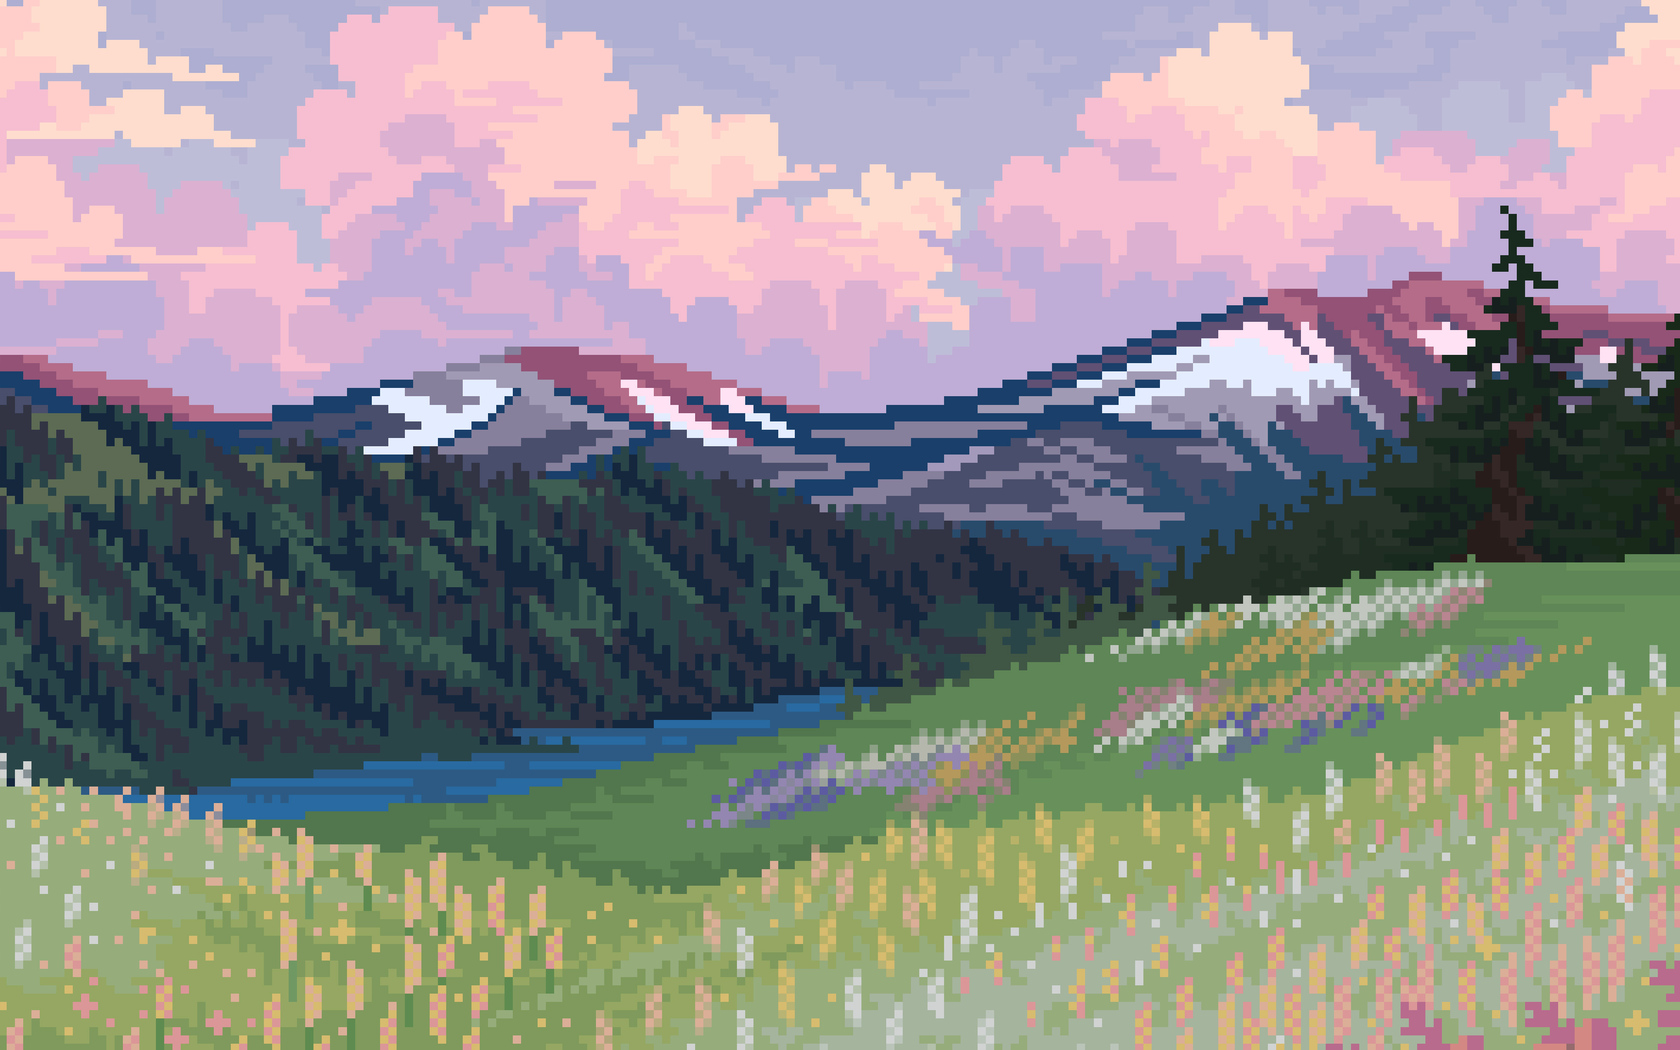 64-bit-nature-mr.jpg